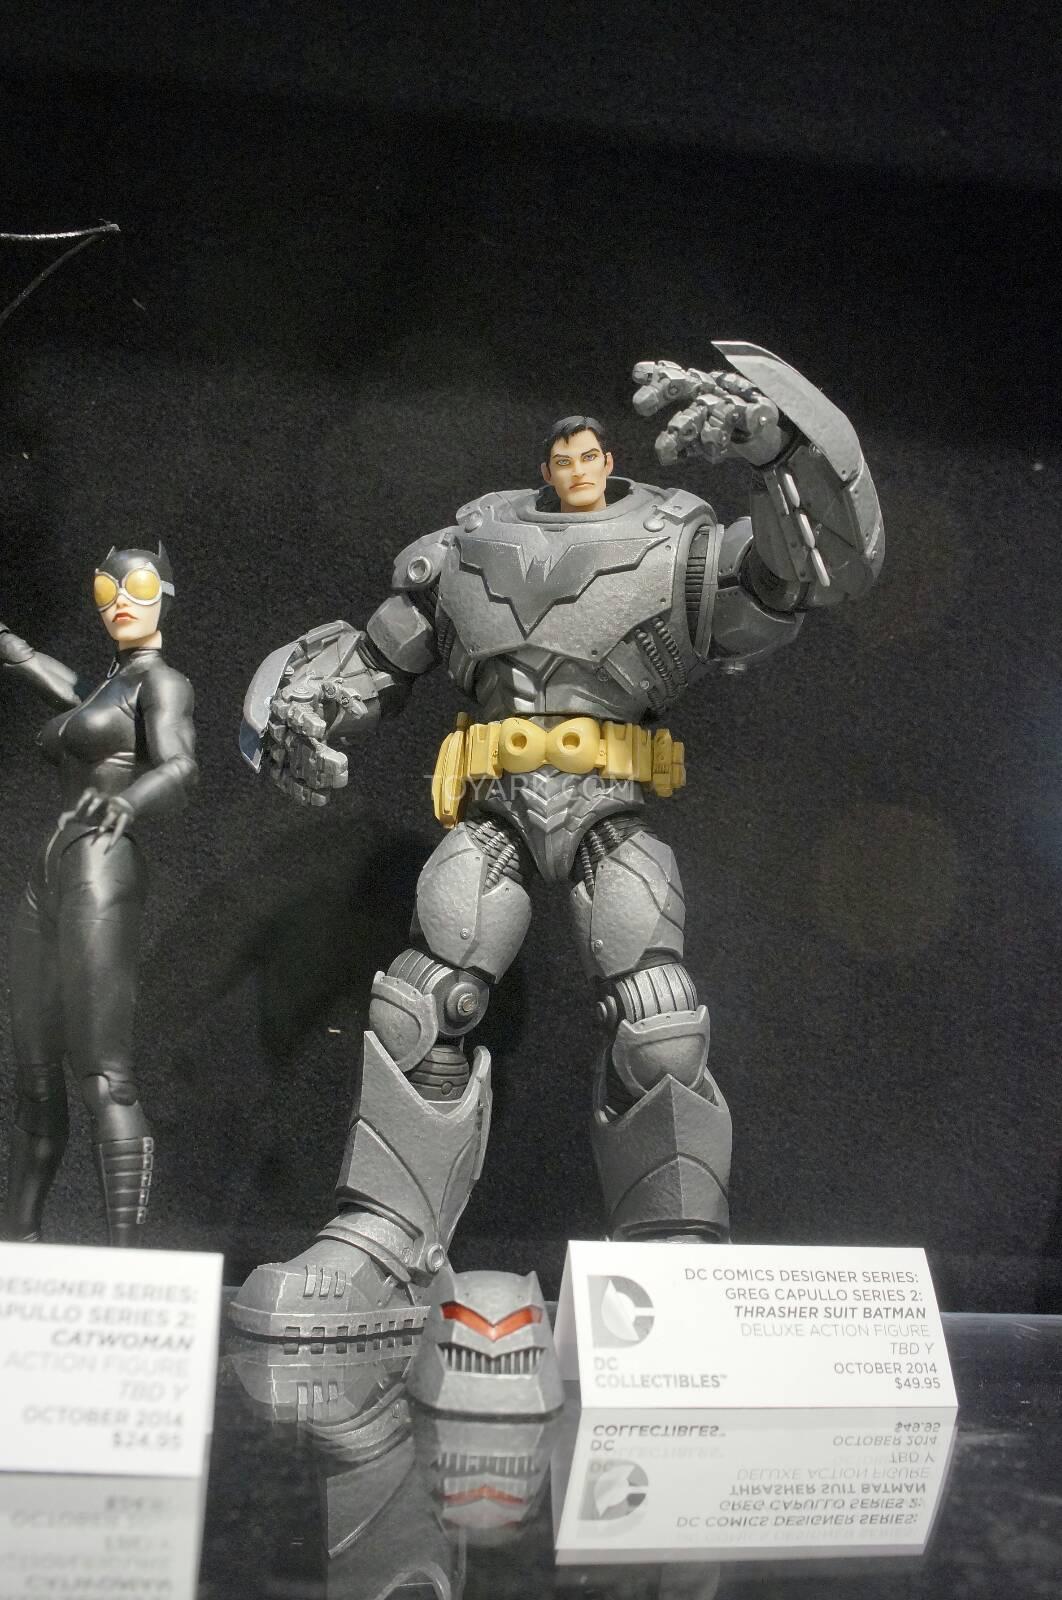 [Toy Fair 2014] DC Collectibles Toy-Fair-2014-DC-Collectibles-099